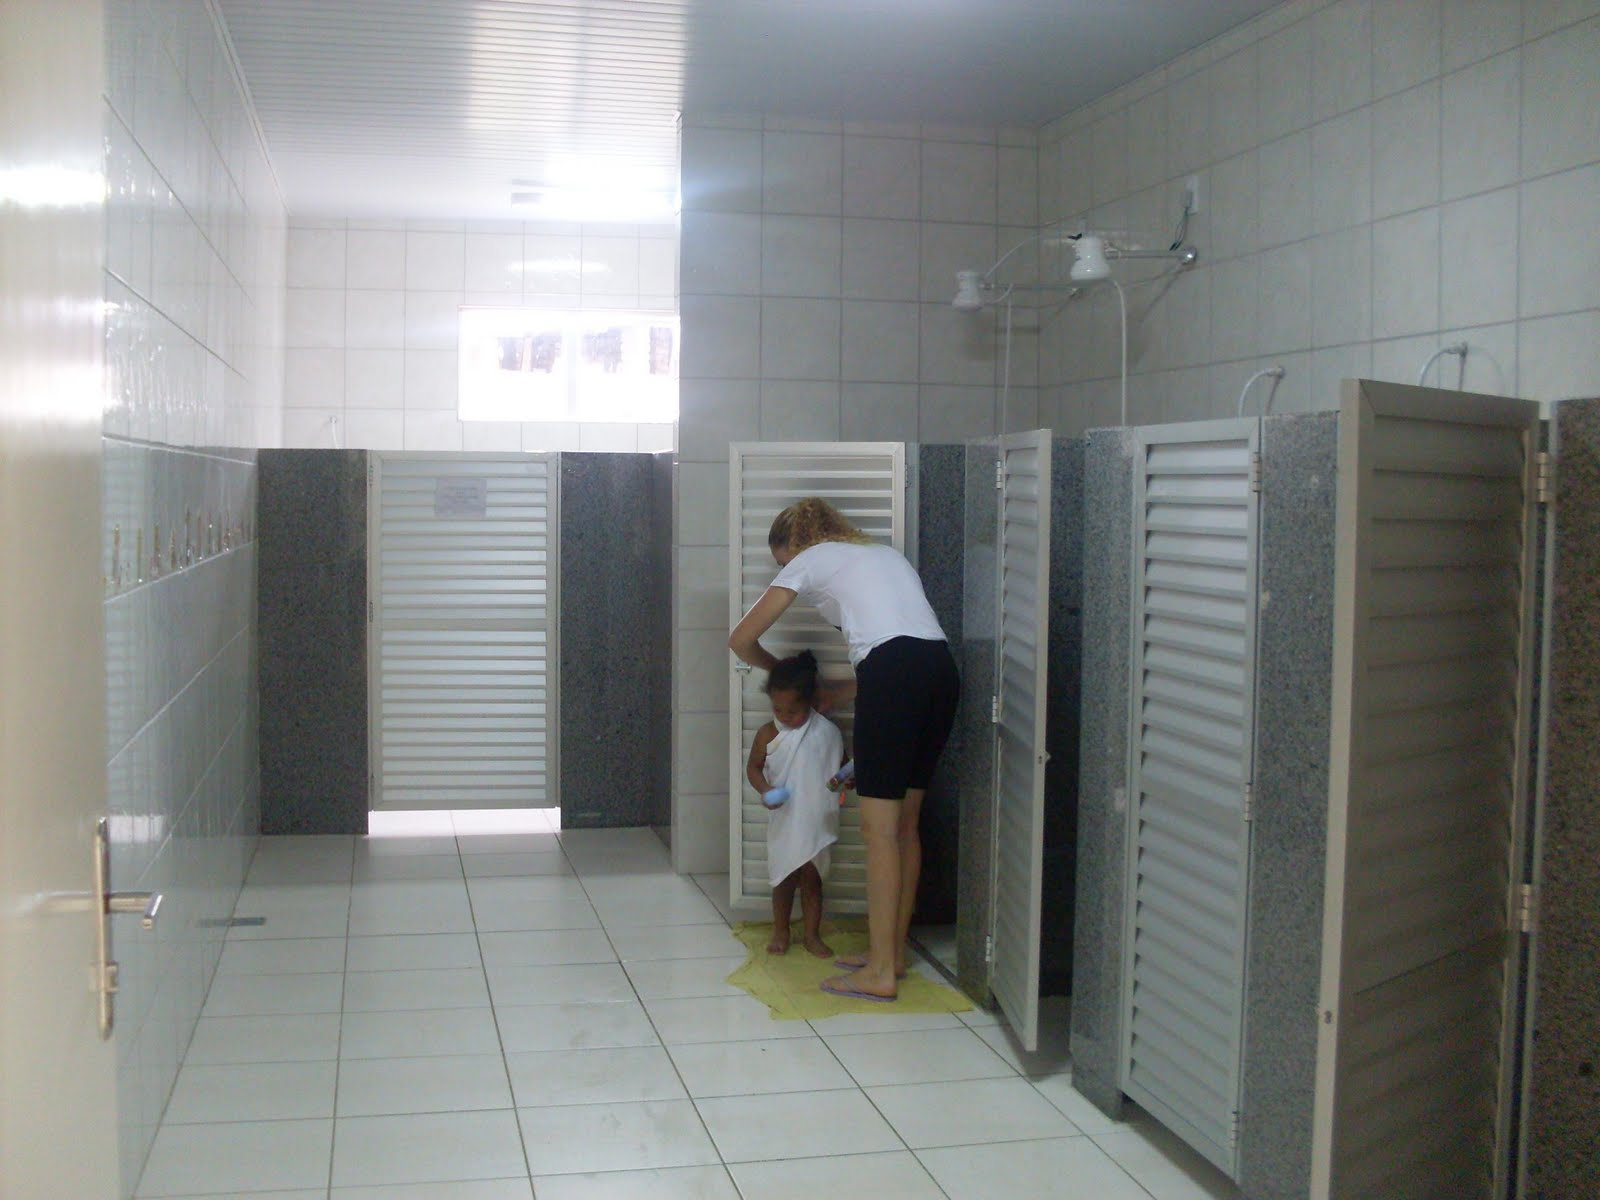 02 Banheiros: 01 Masculino e 01 Feminino #66614A 1600 1200